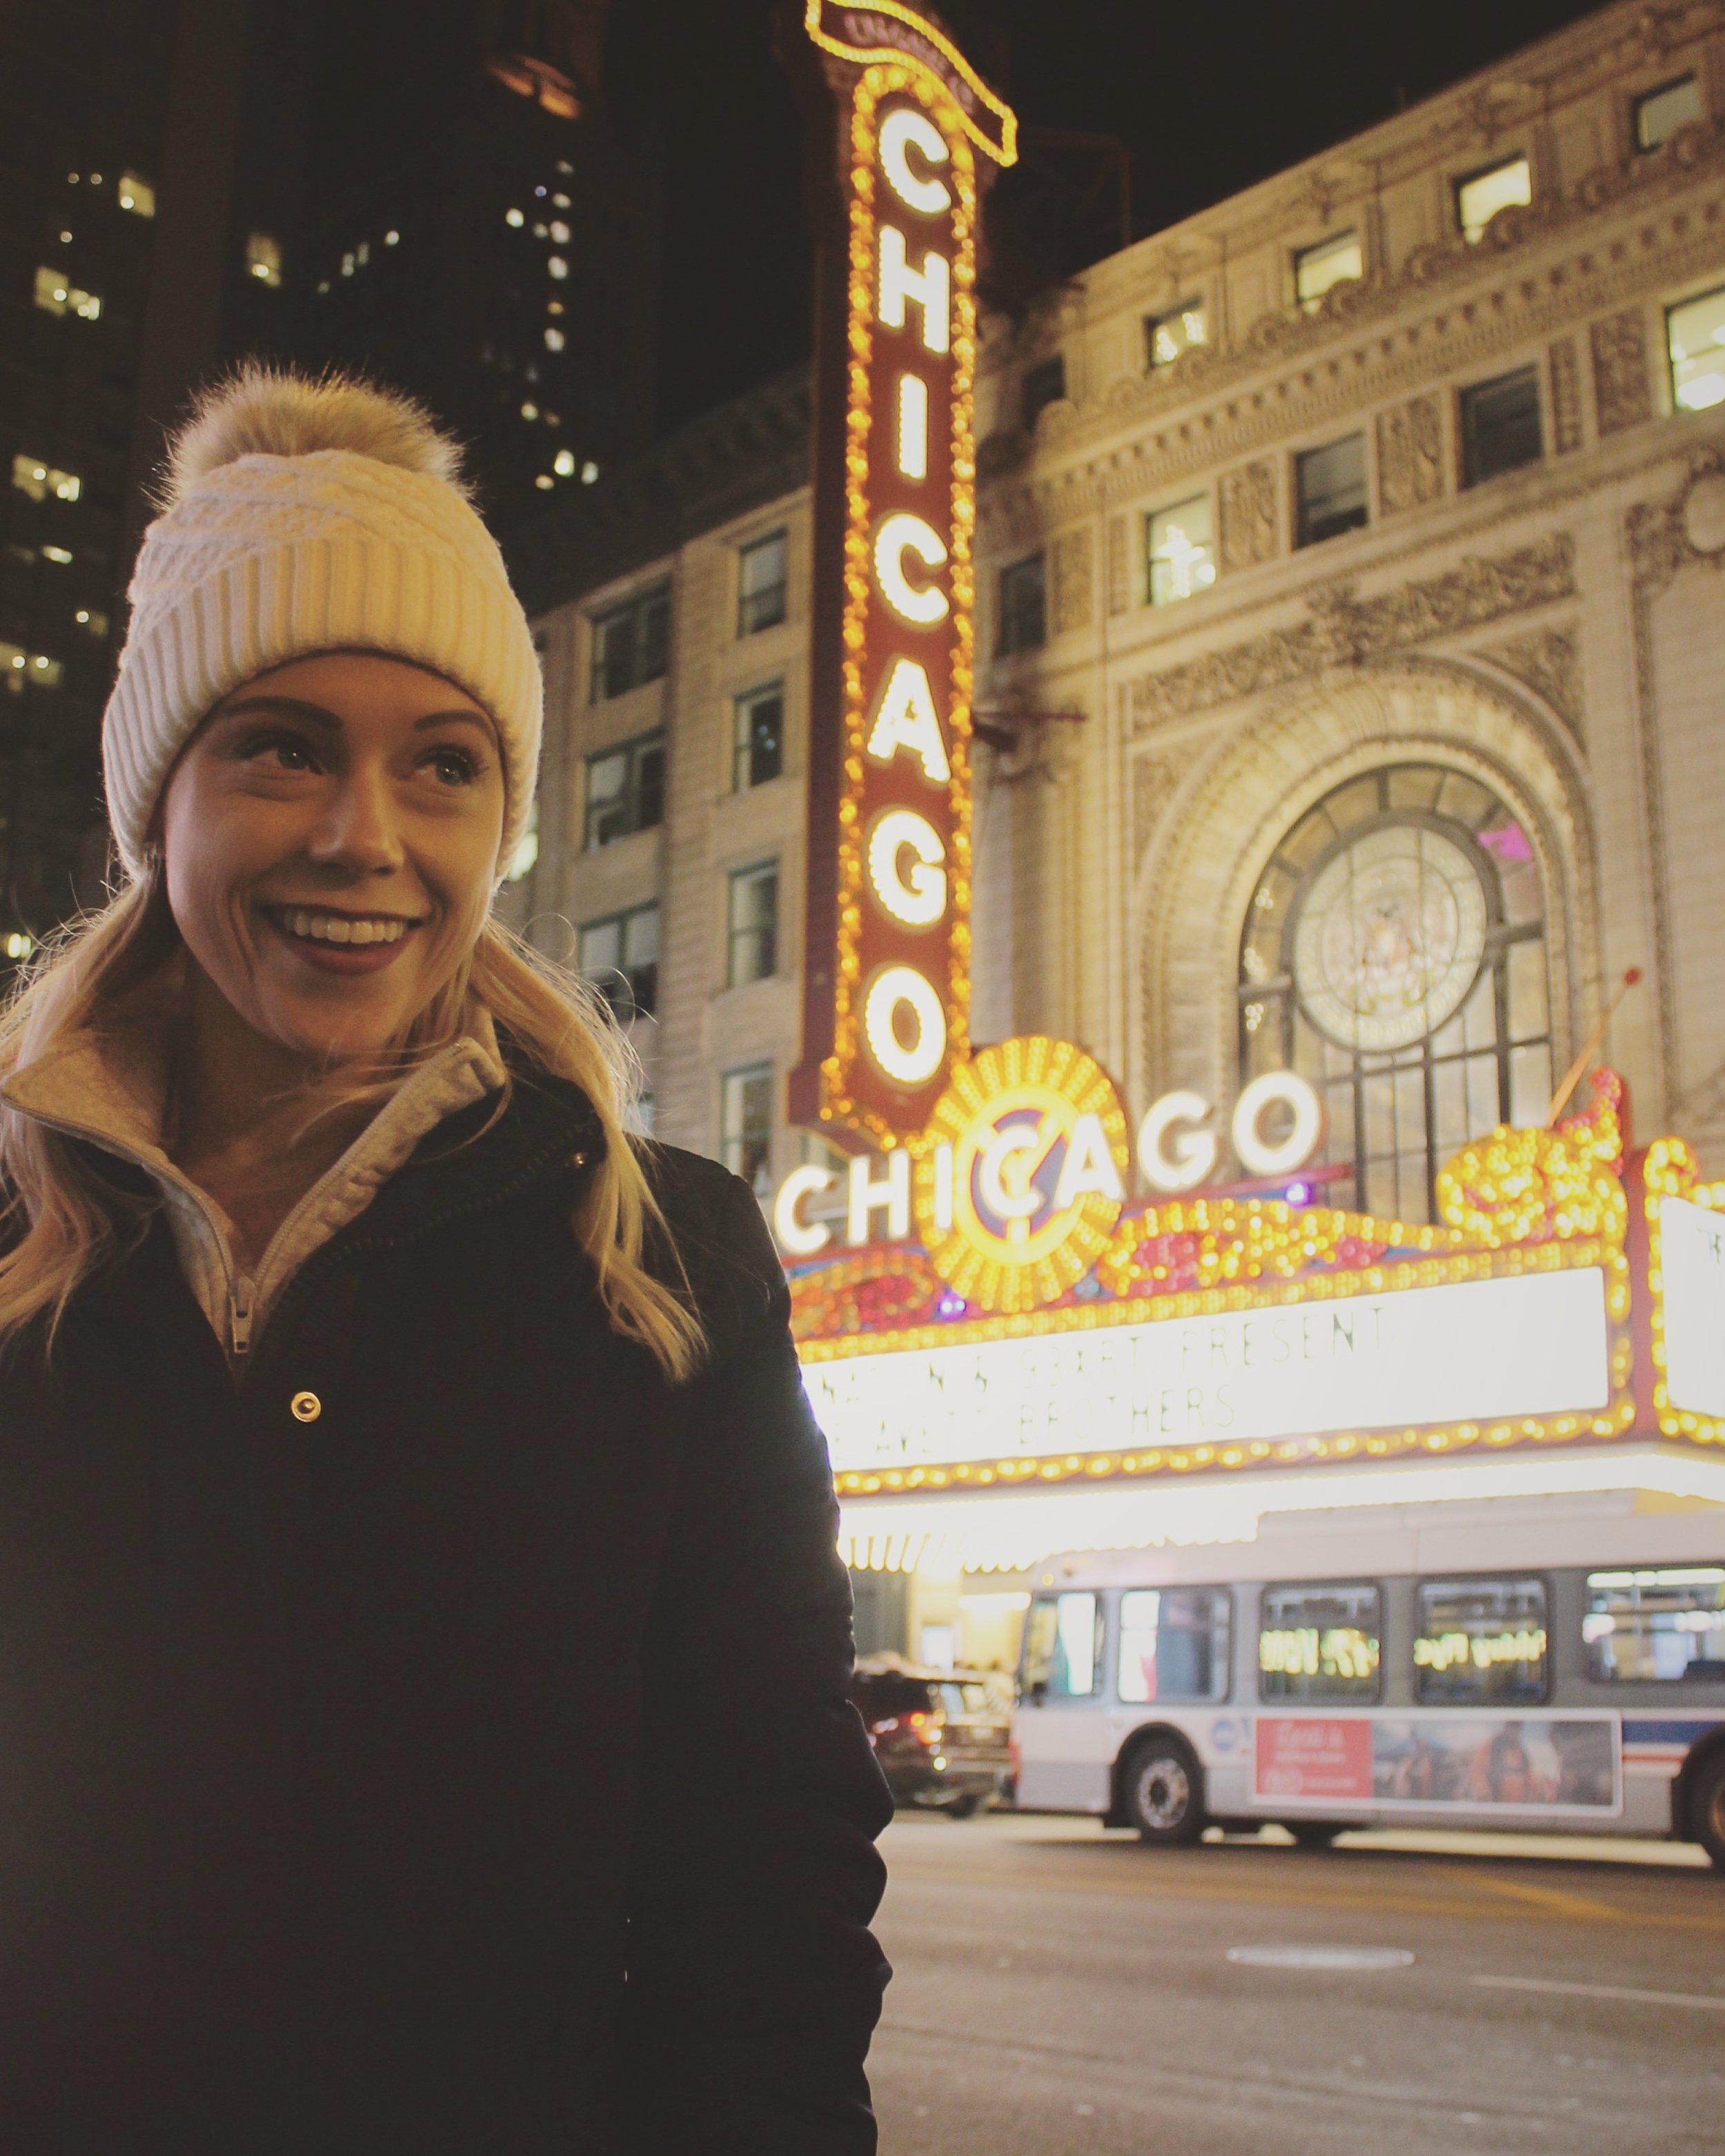 Outside the Chicago Theater   @emilyminormusic on Instagram